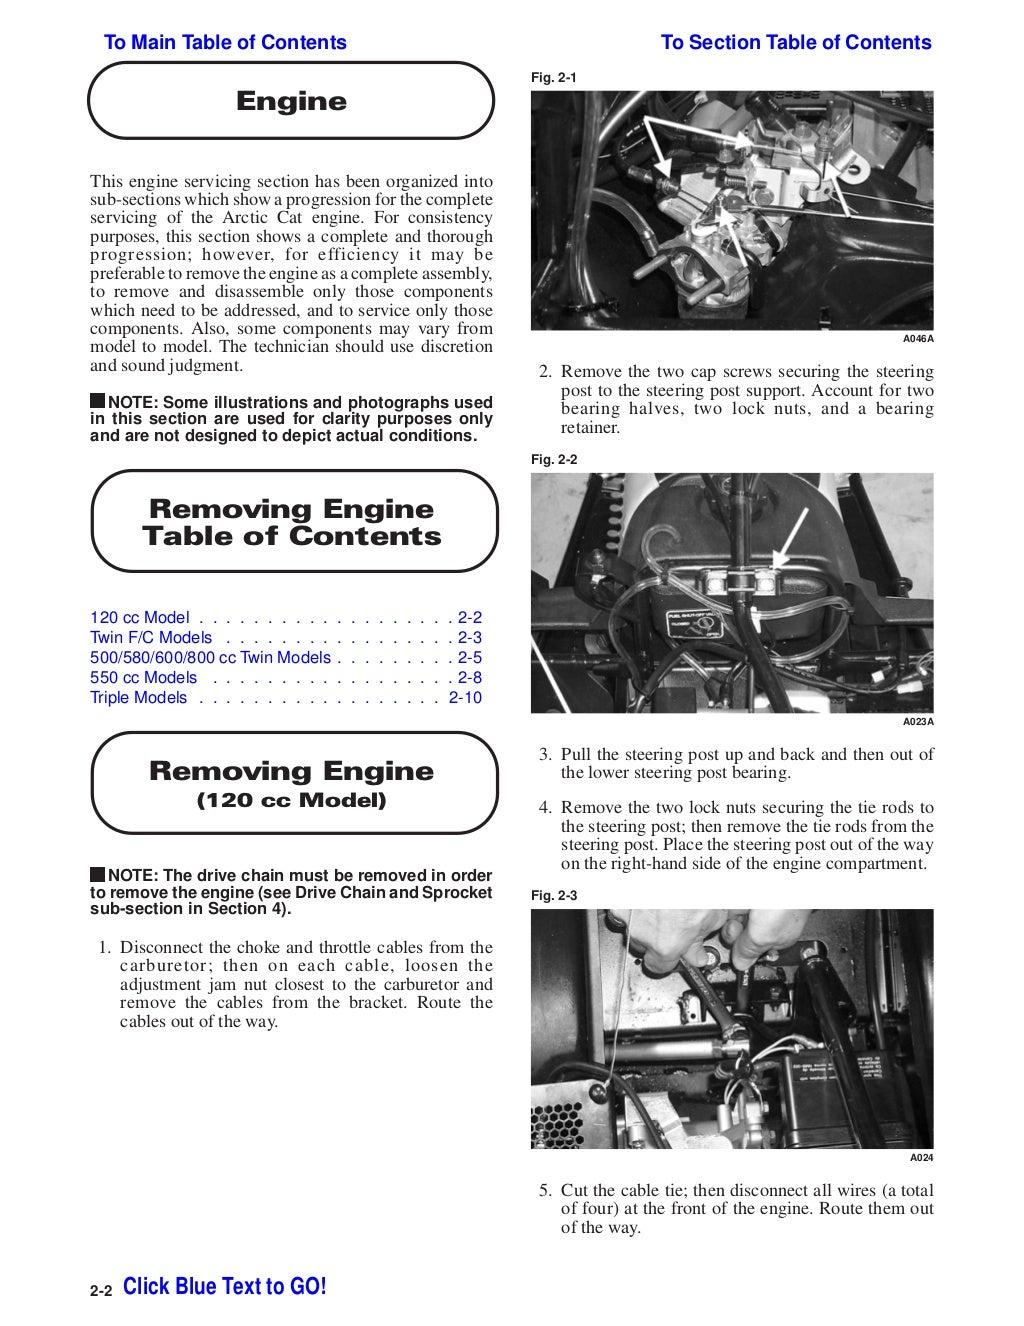 2001 Arctic Cat ZRT 600 LE SNOWMOBILE Service Repair Manual